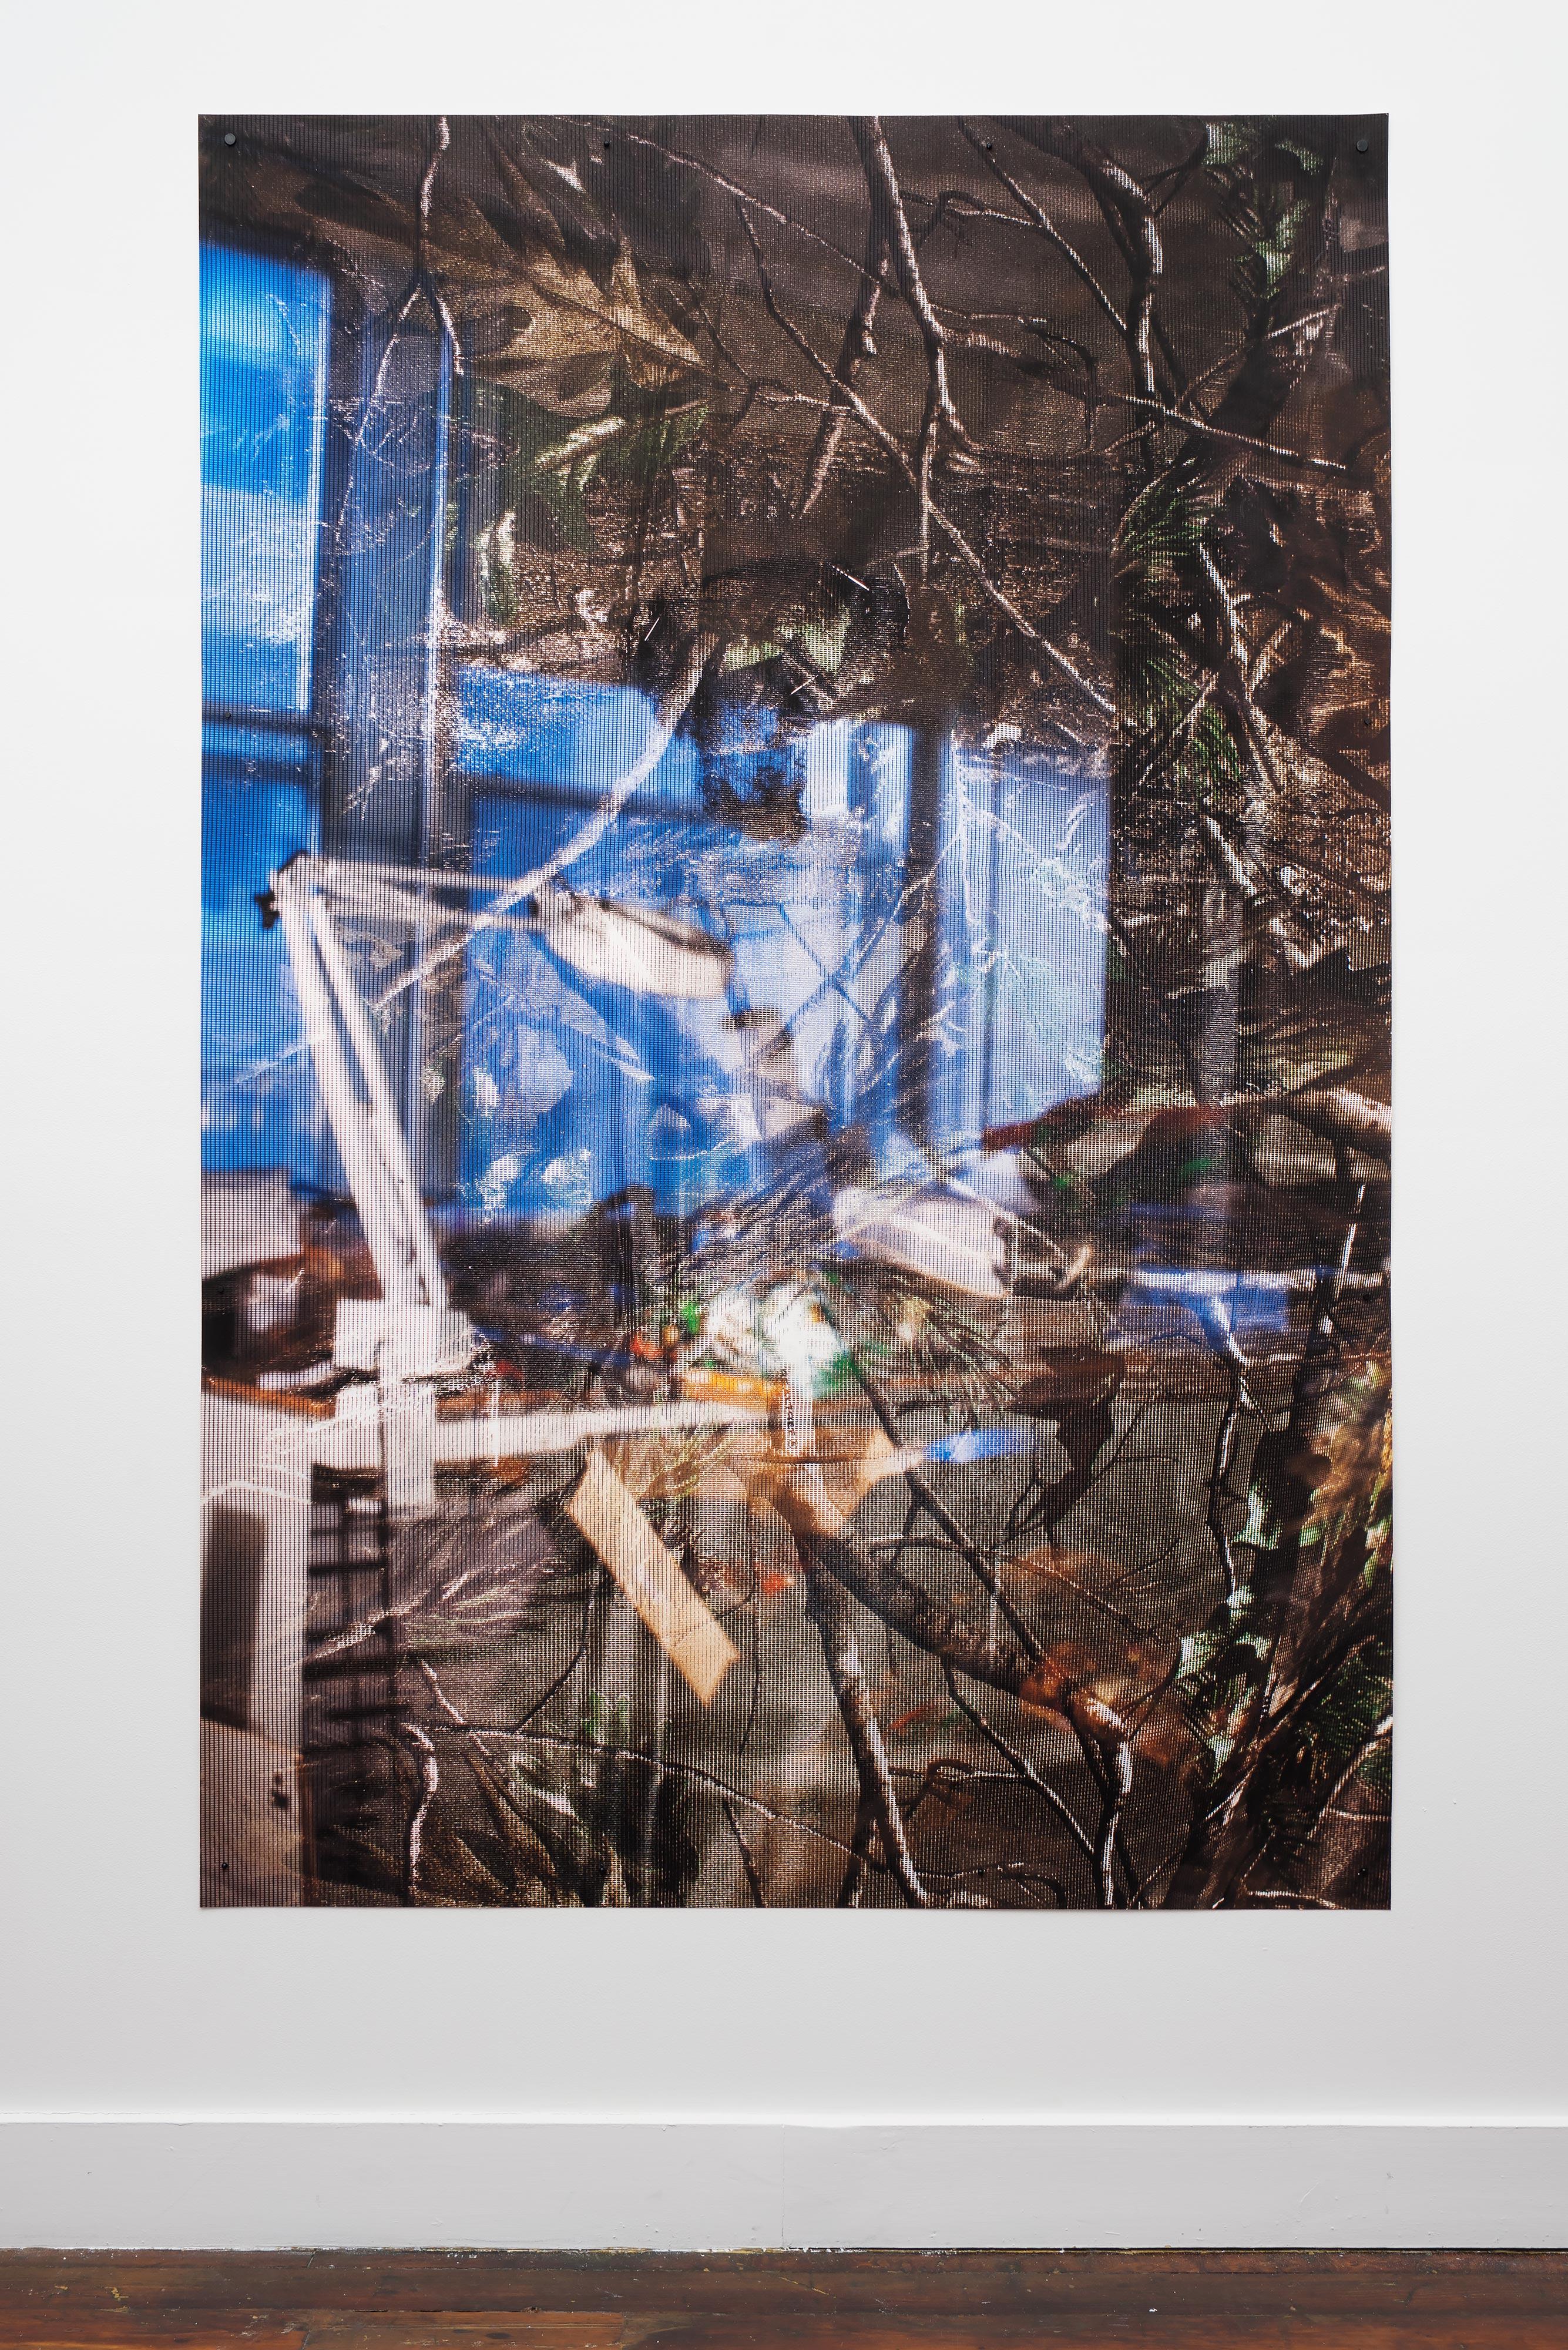 ELLEN BROOKS<br>Untitled (daylight)<br>2016<br>Digital pigment print<br>58 x 87 in (147 x 221 cm)